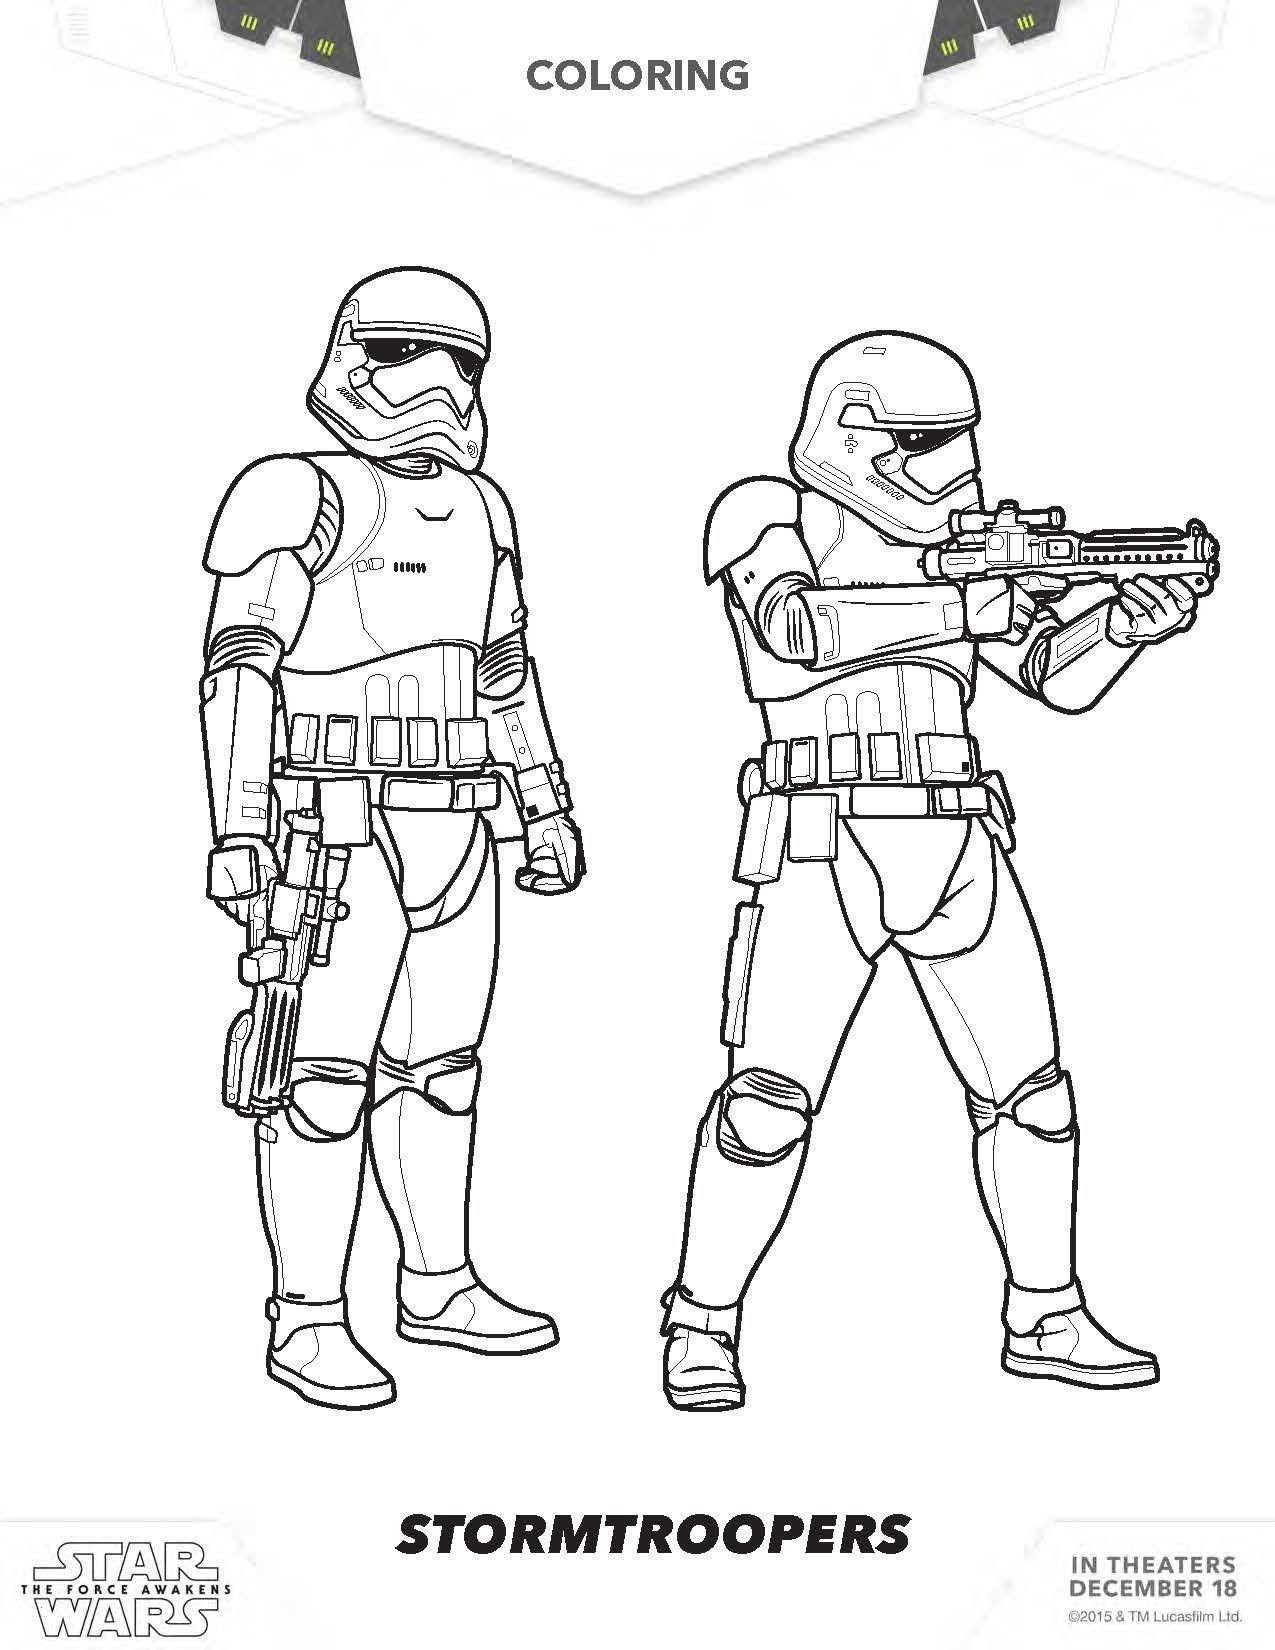 Ausmalbilder Star Wars Genial Coloring & Crafts Groovy Star Wars Coloring Poster as Ausmalbilder Fotos